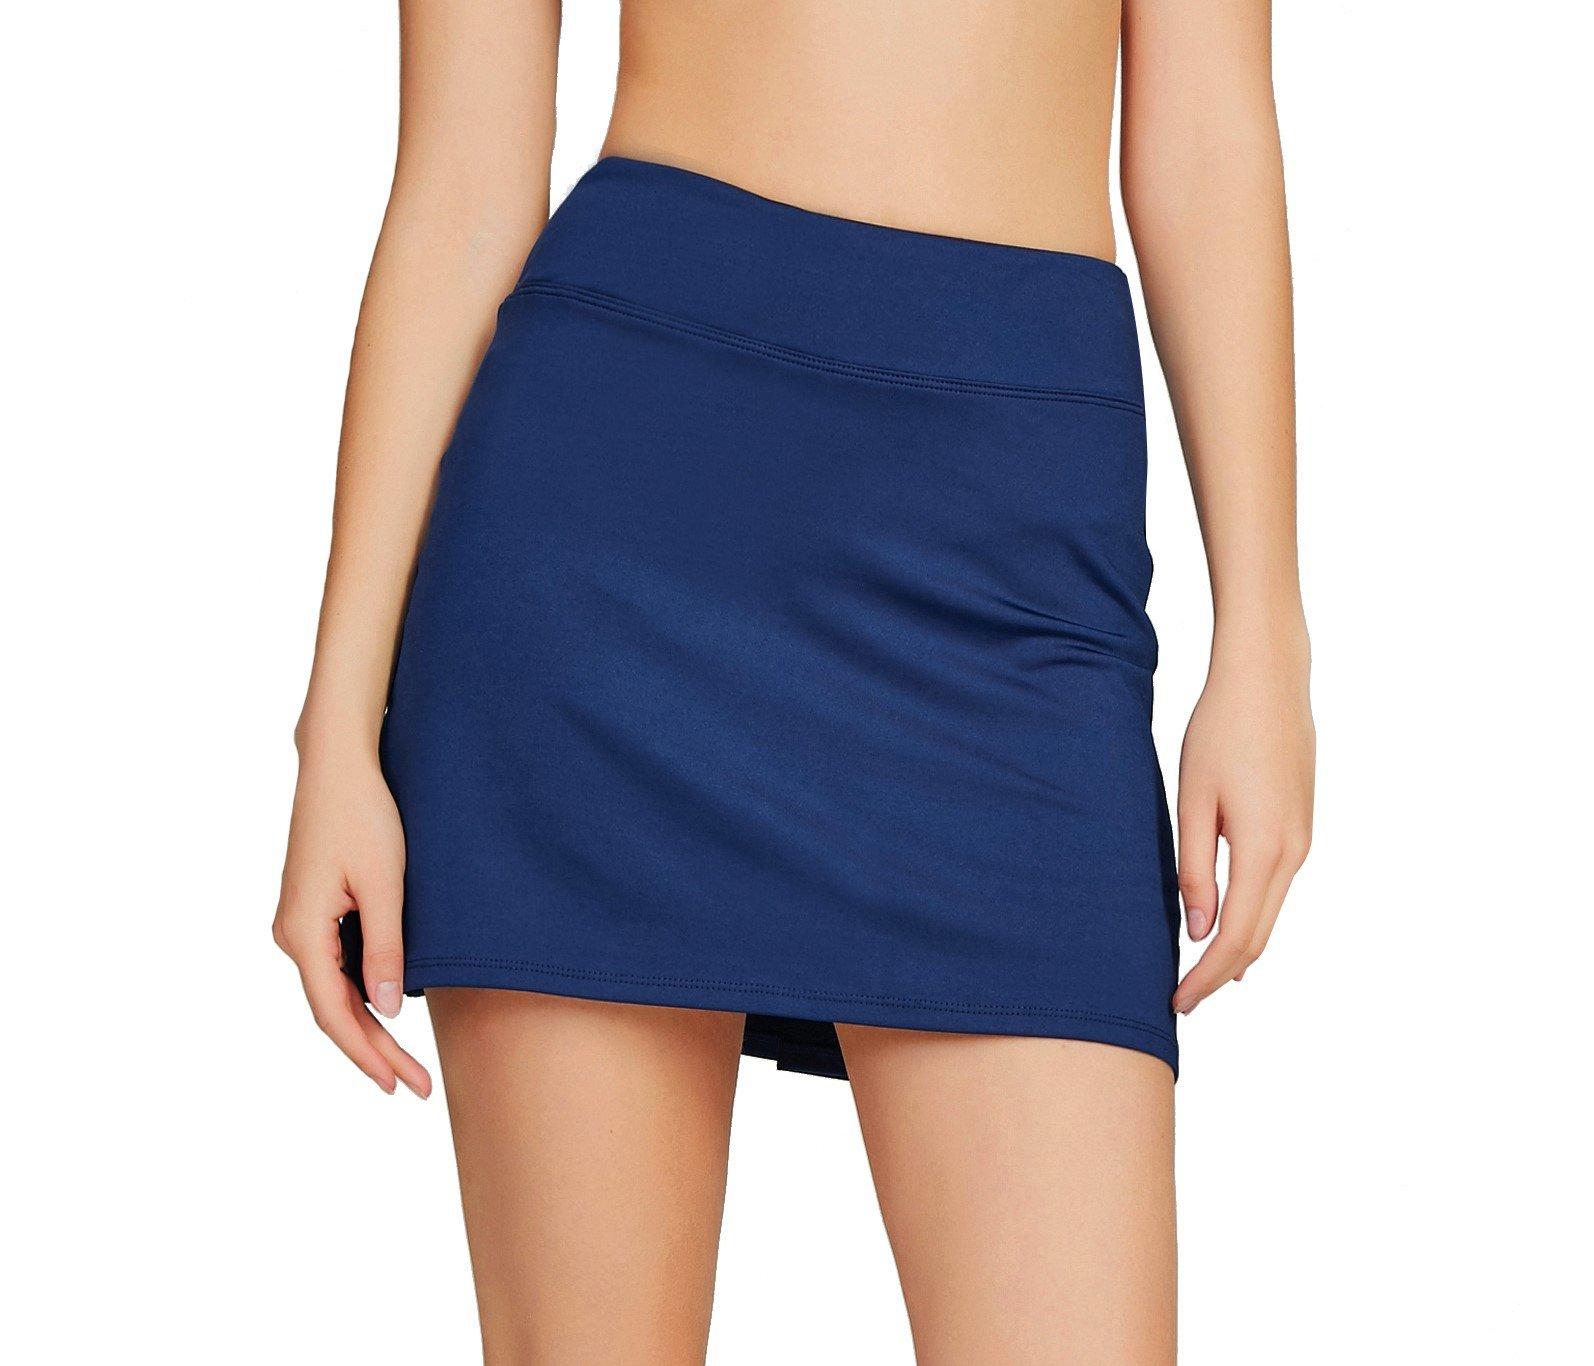 Women's Casual Pleated Tennis Golf Skirt with Underneath Shorts Running Skorts d_bu xs